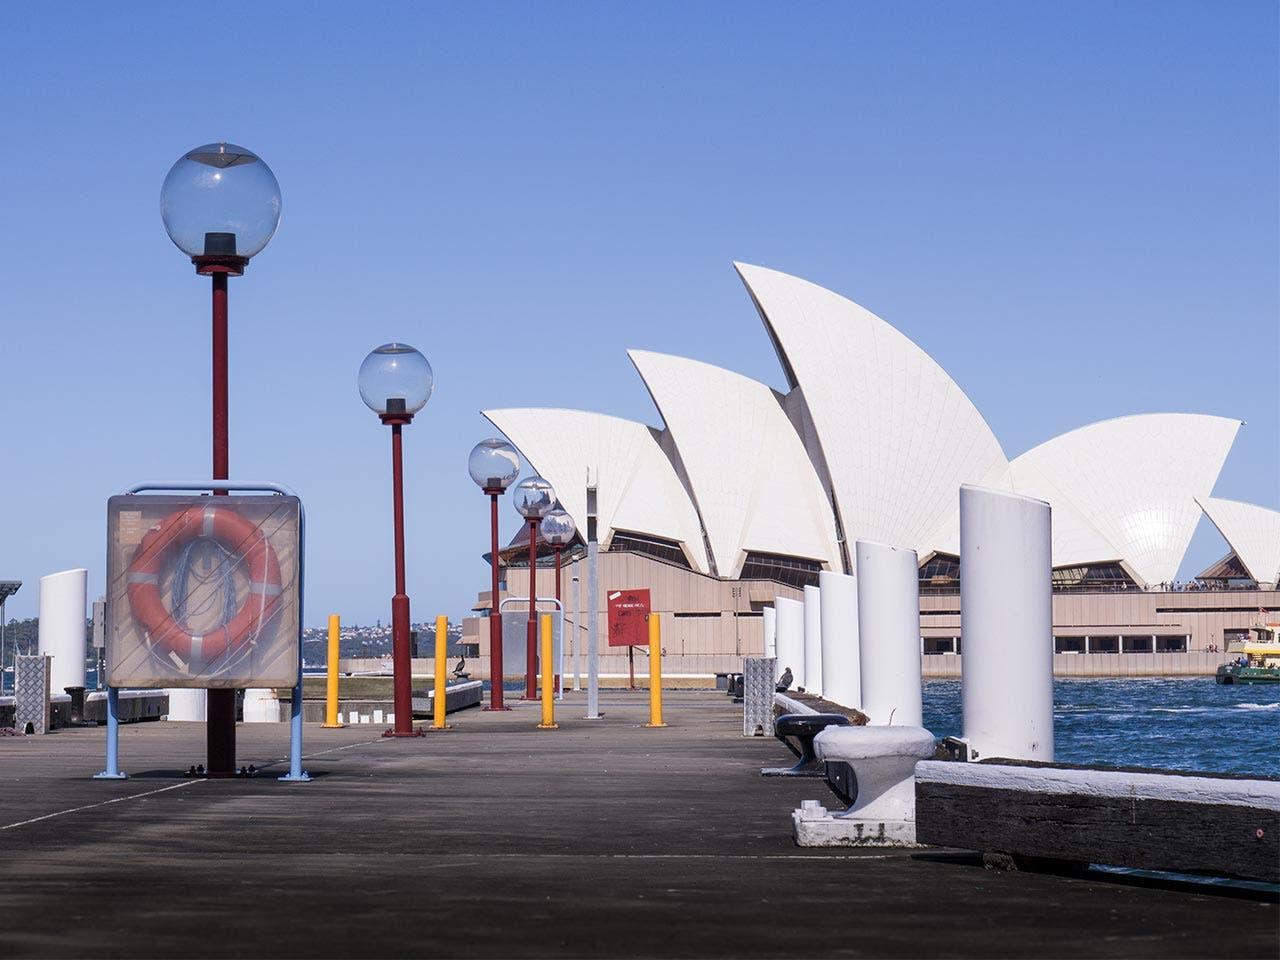 Australia | palawat744/Shutterstock.com